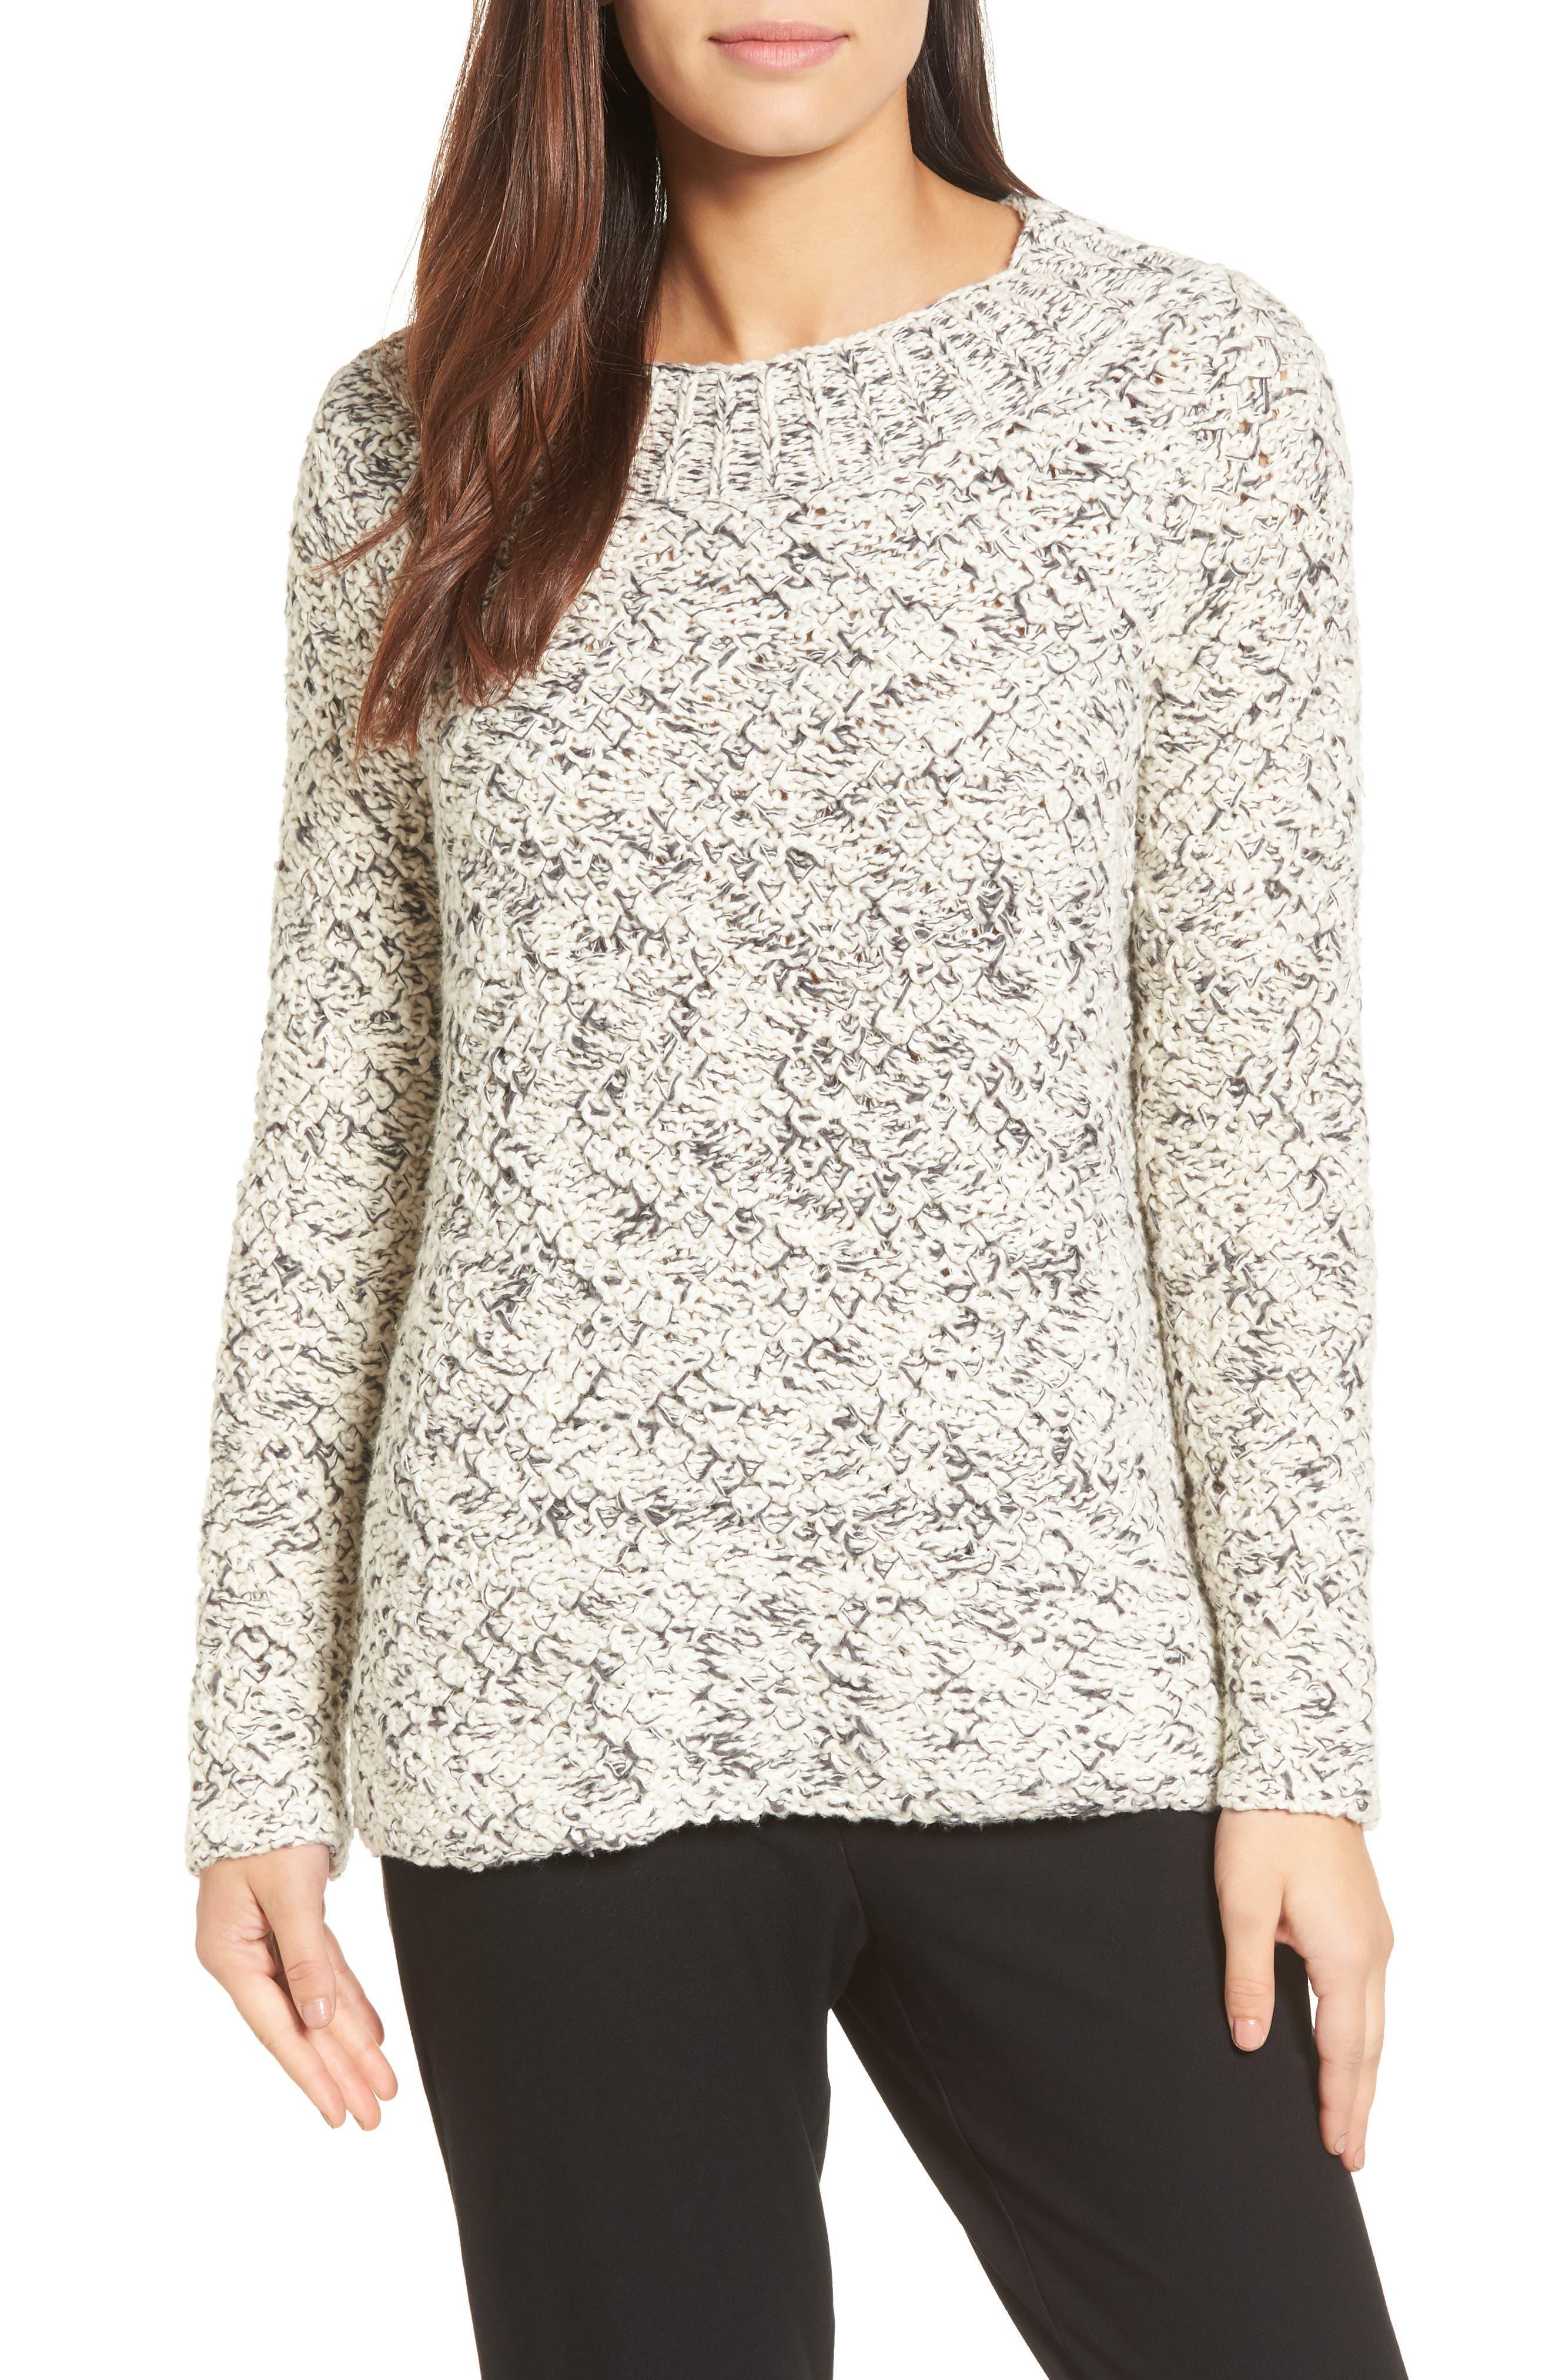 Marled Organic Cotton Sweater,                             Main thumbnail 1, color,                             903